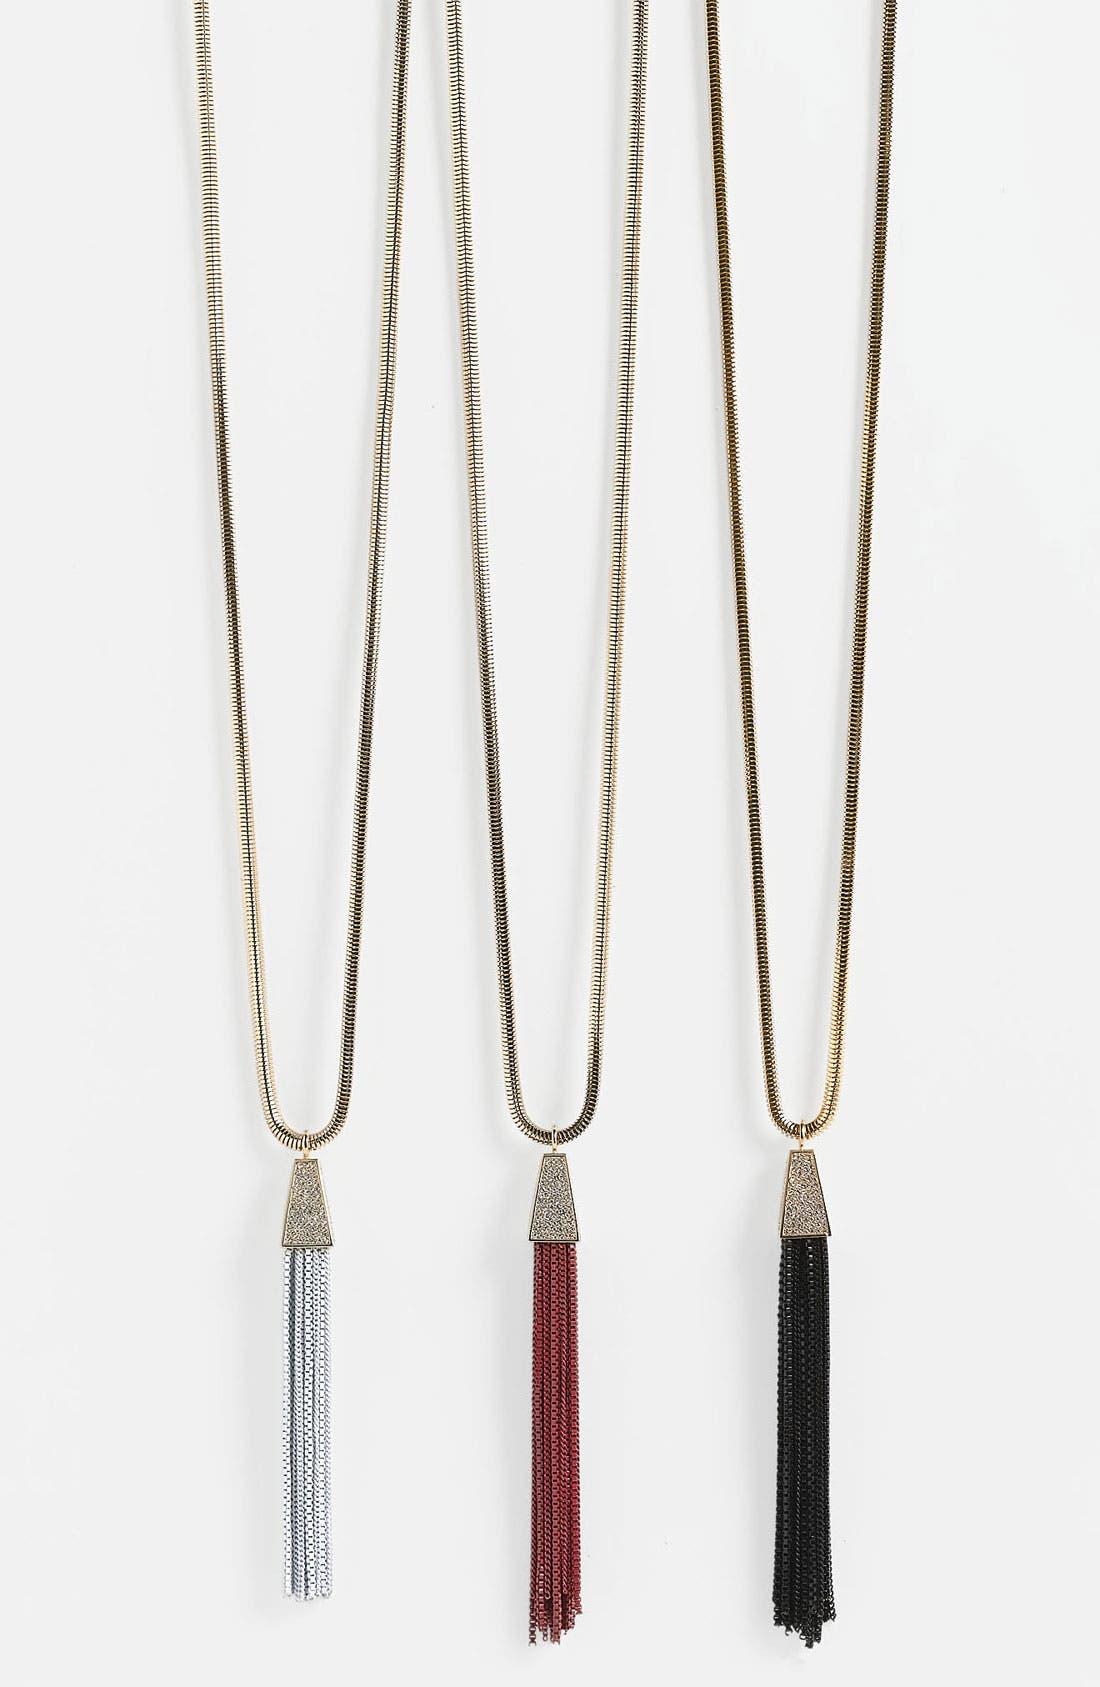 Main Image - Vince Camuto 'Deco' Tassel Pendant Necklace